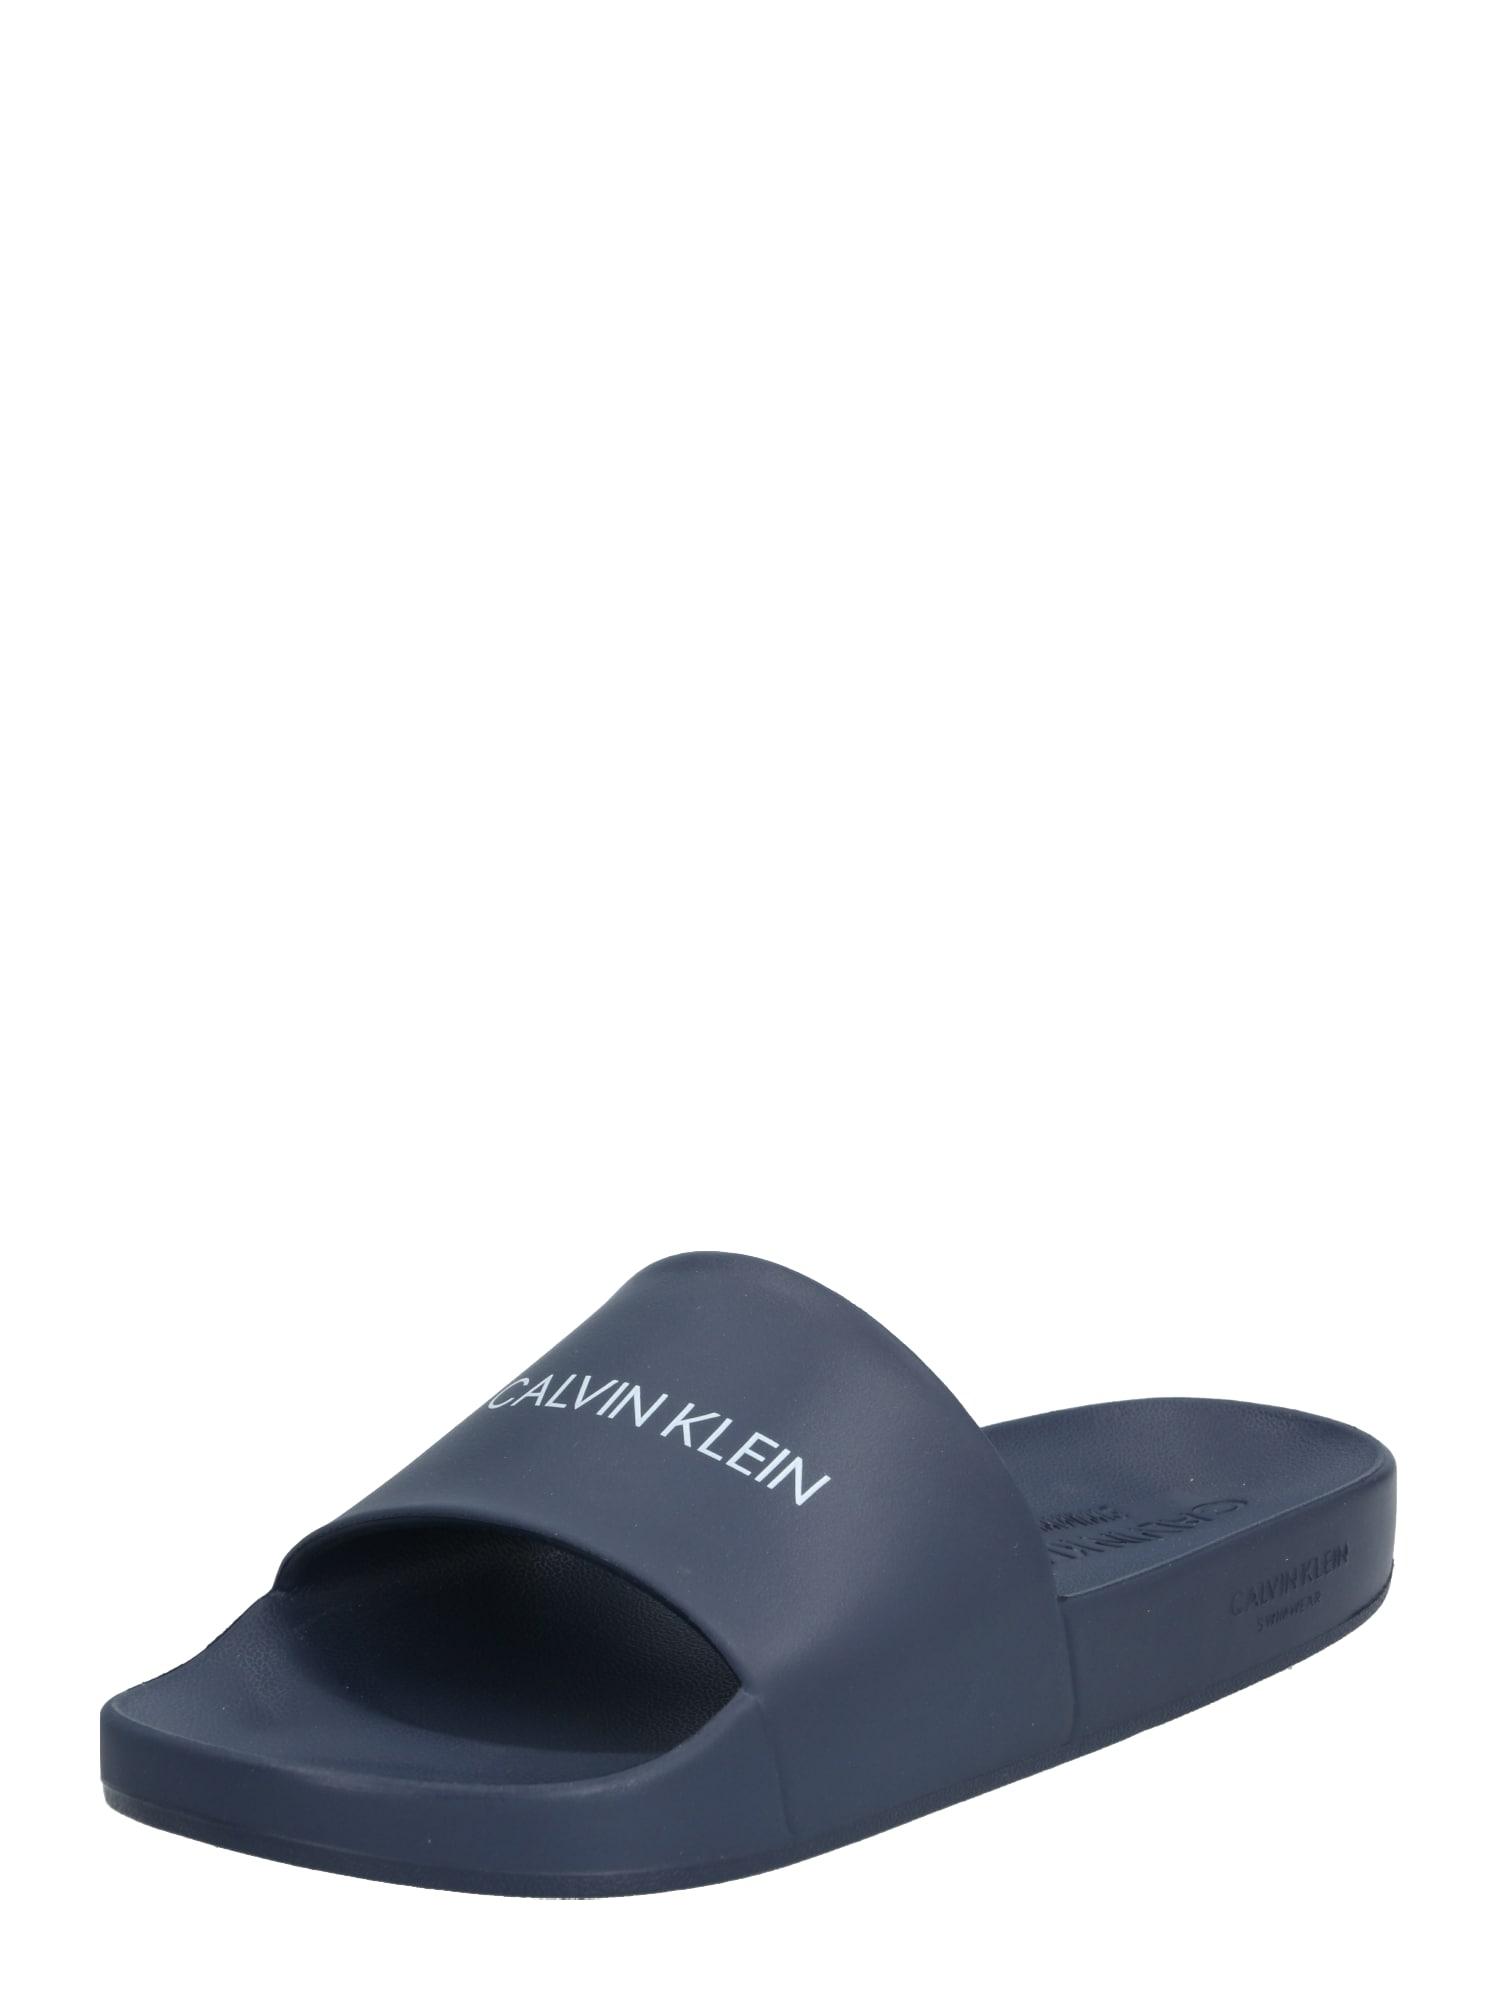 Calvin Klein Šľapky 'ONE MOLD'  tmavomodrá